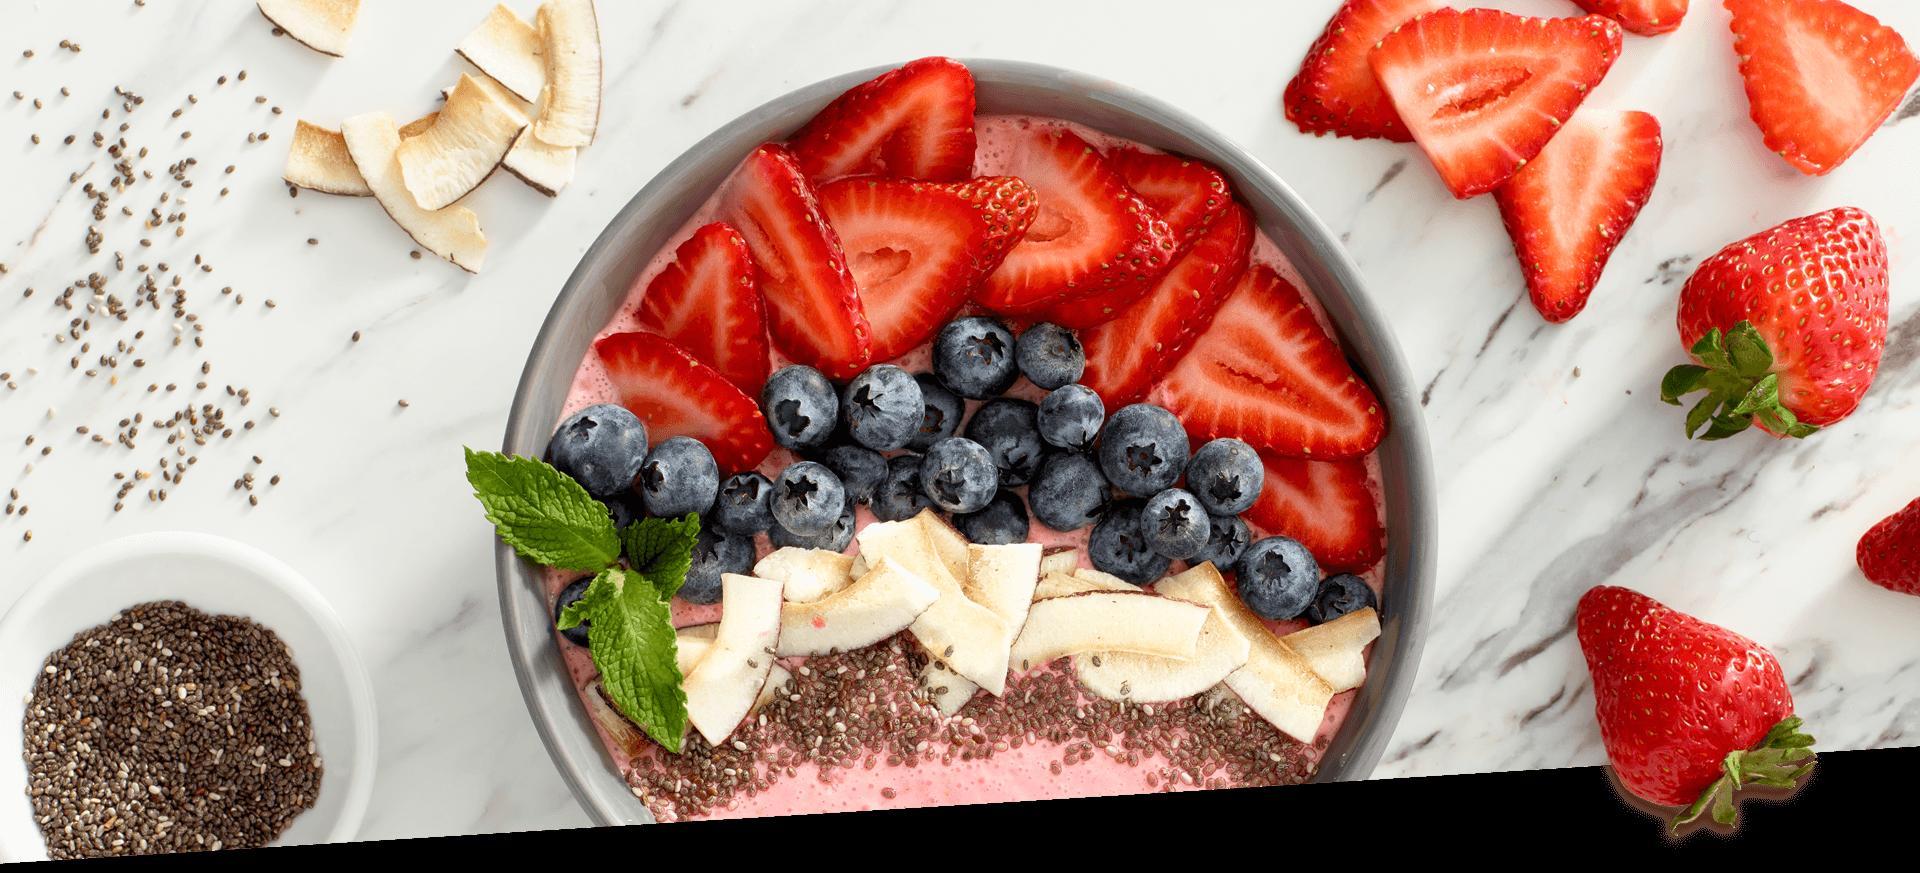 strawberry smoothie bowl new header 2